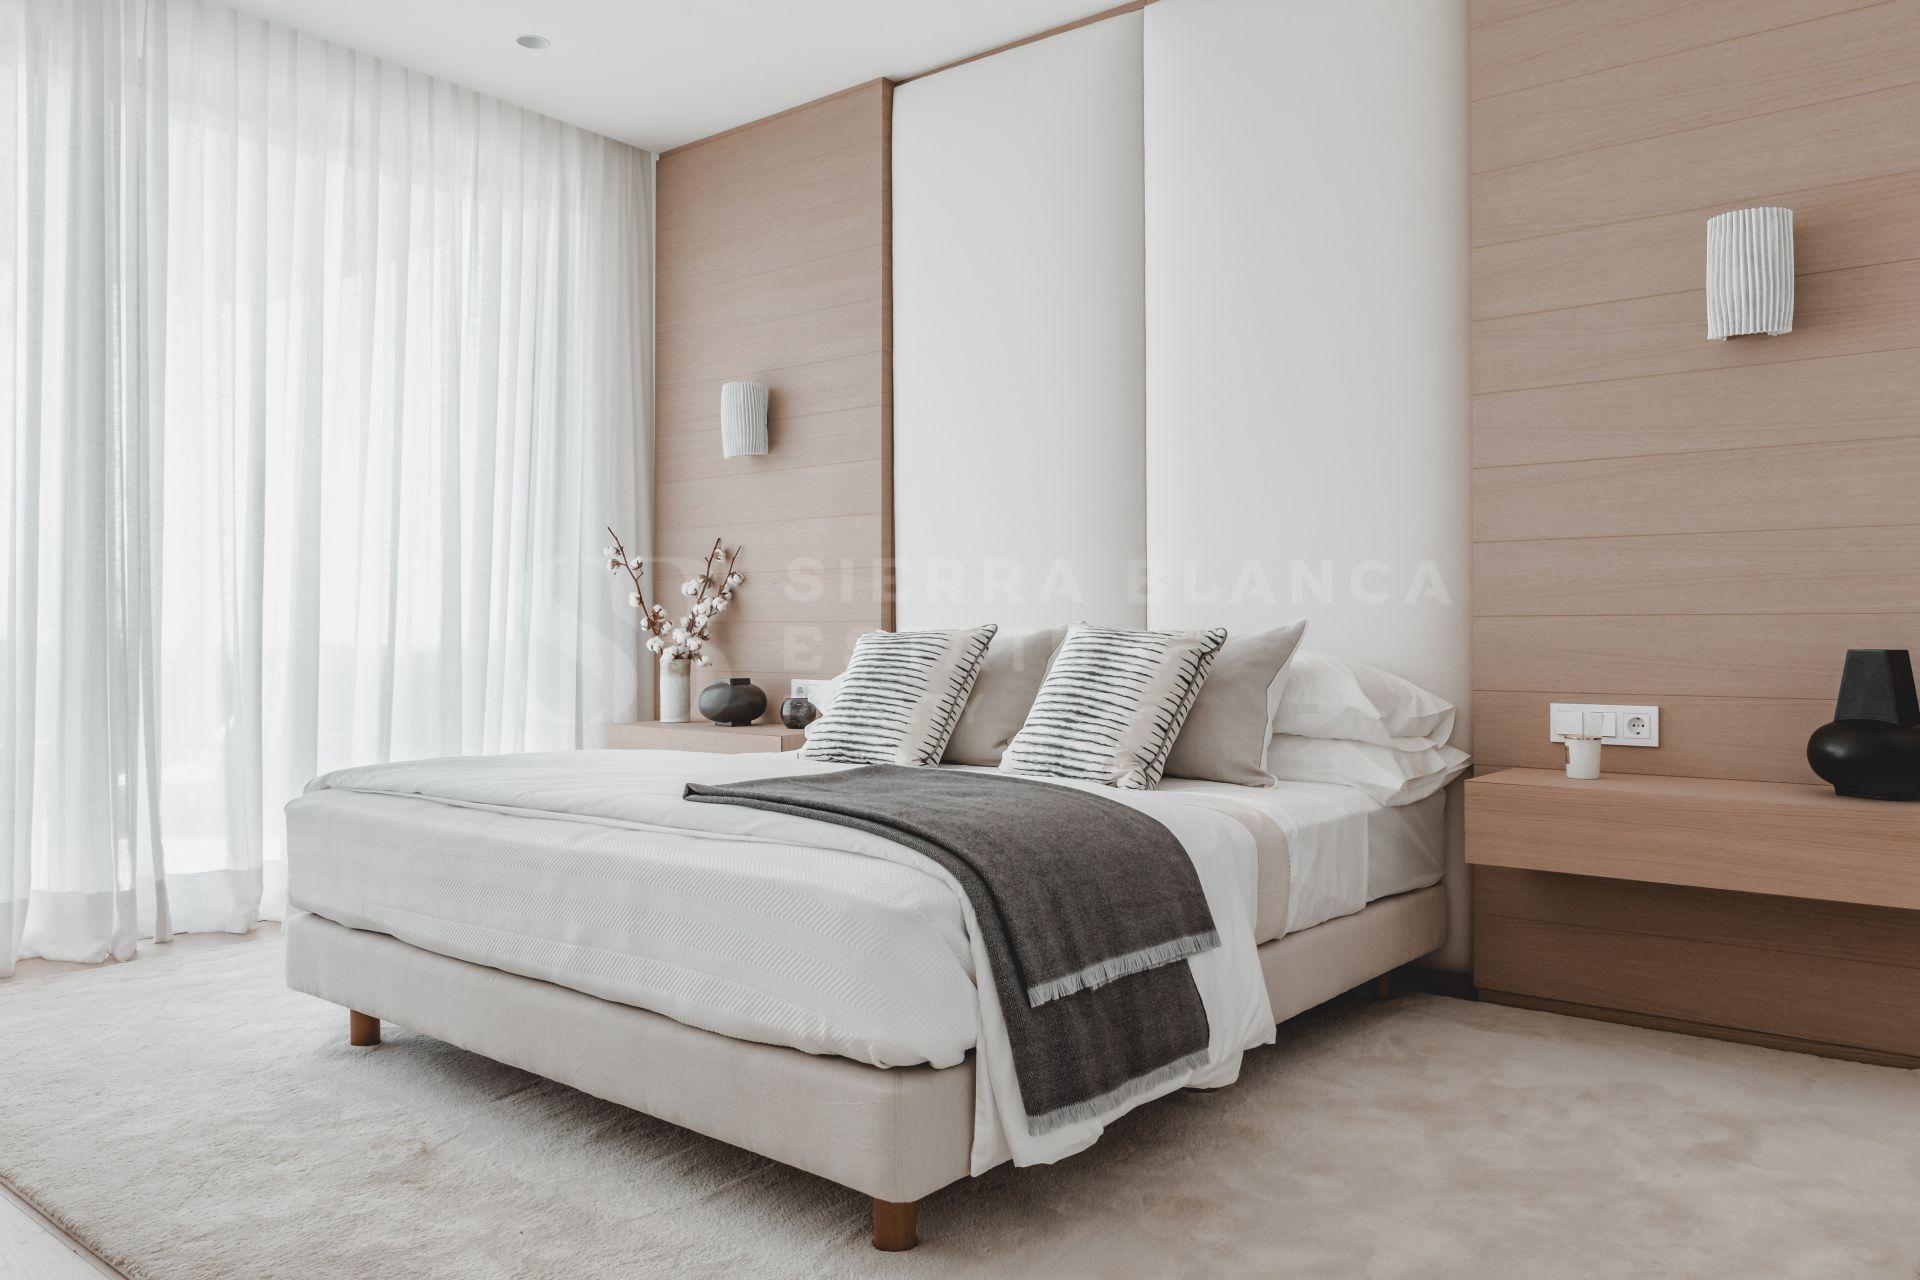 Marbella Club Hills - Elegant Residences in Benahavís Ready to Move In